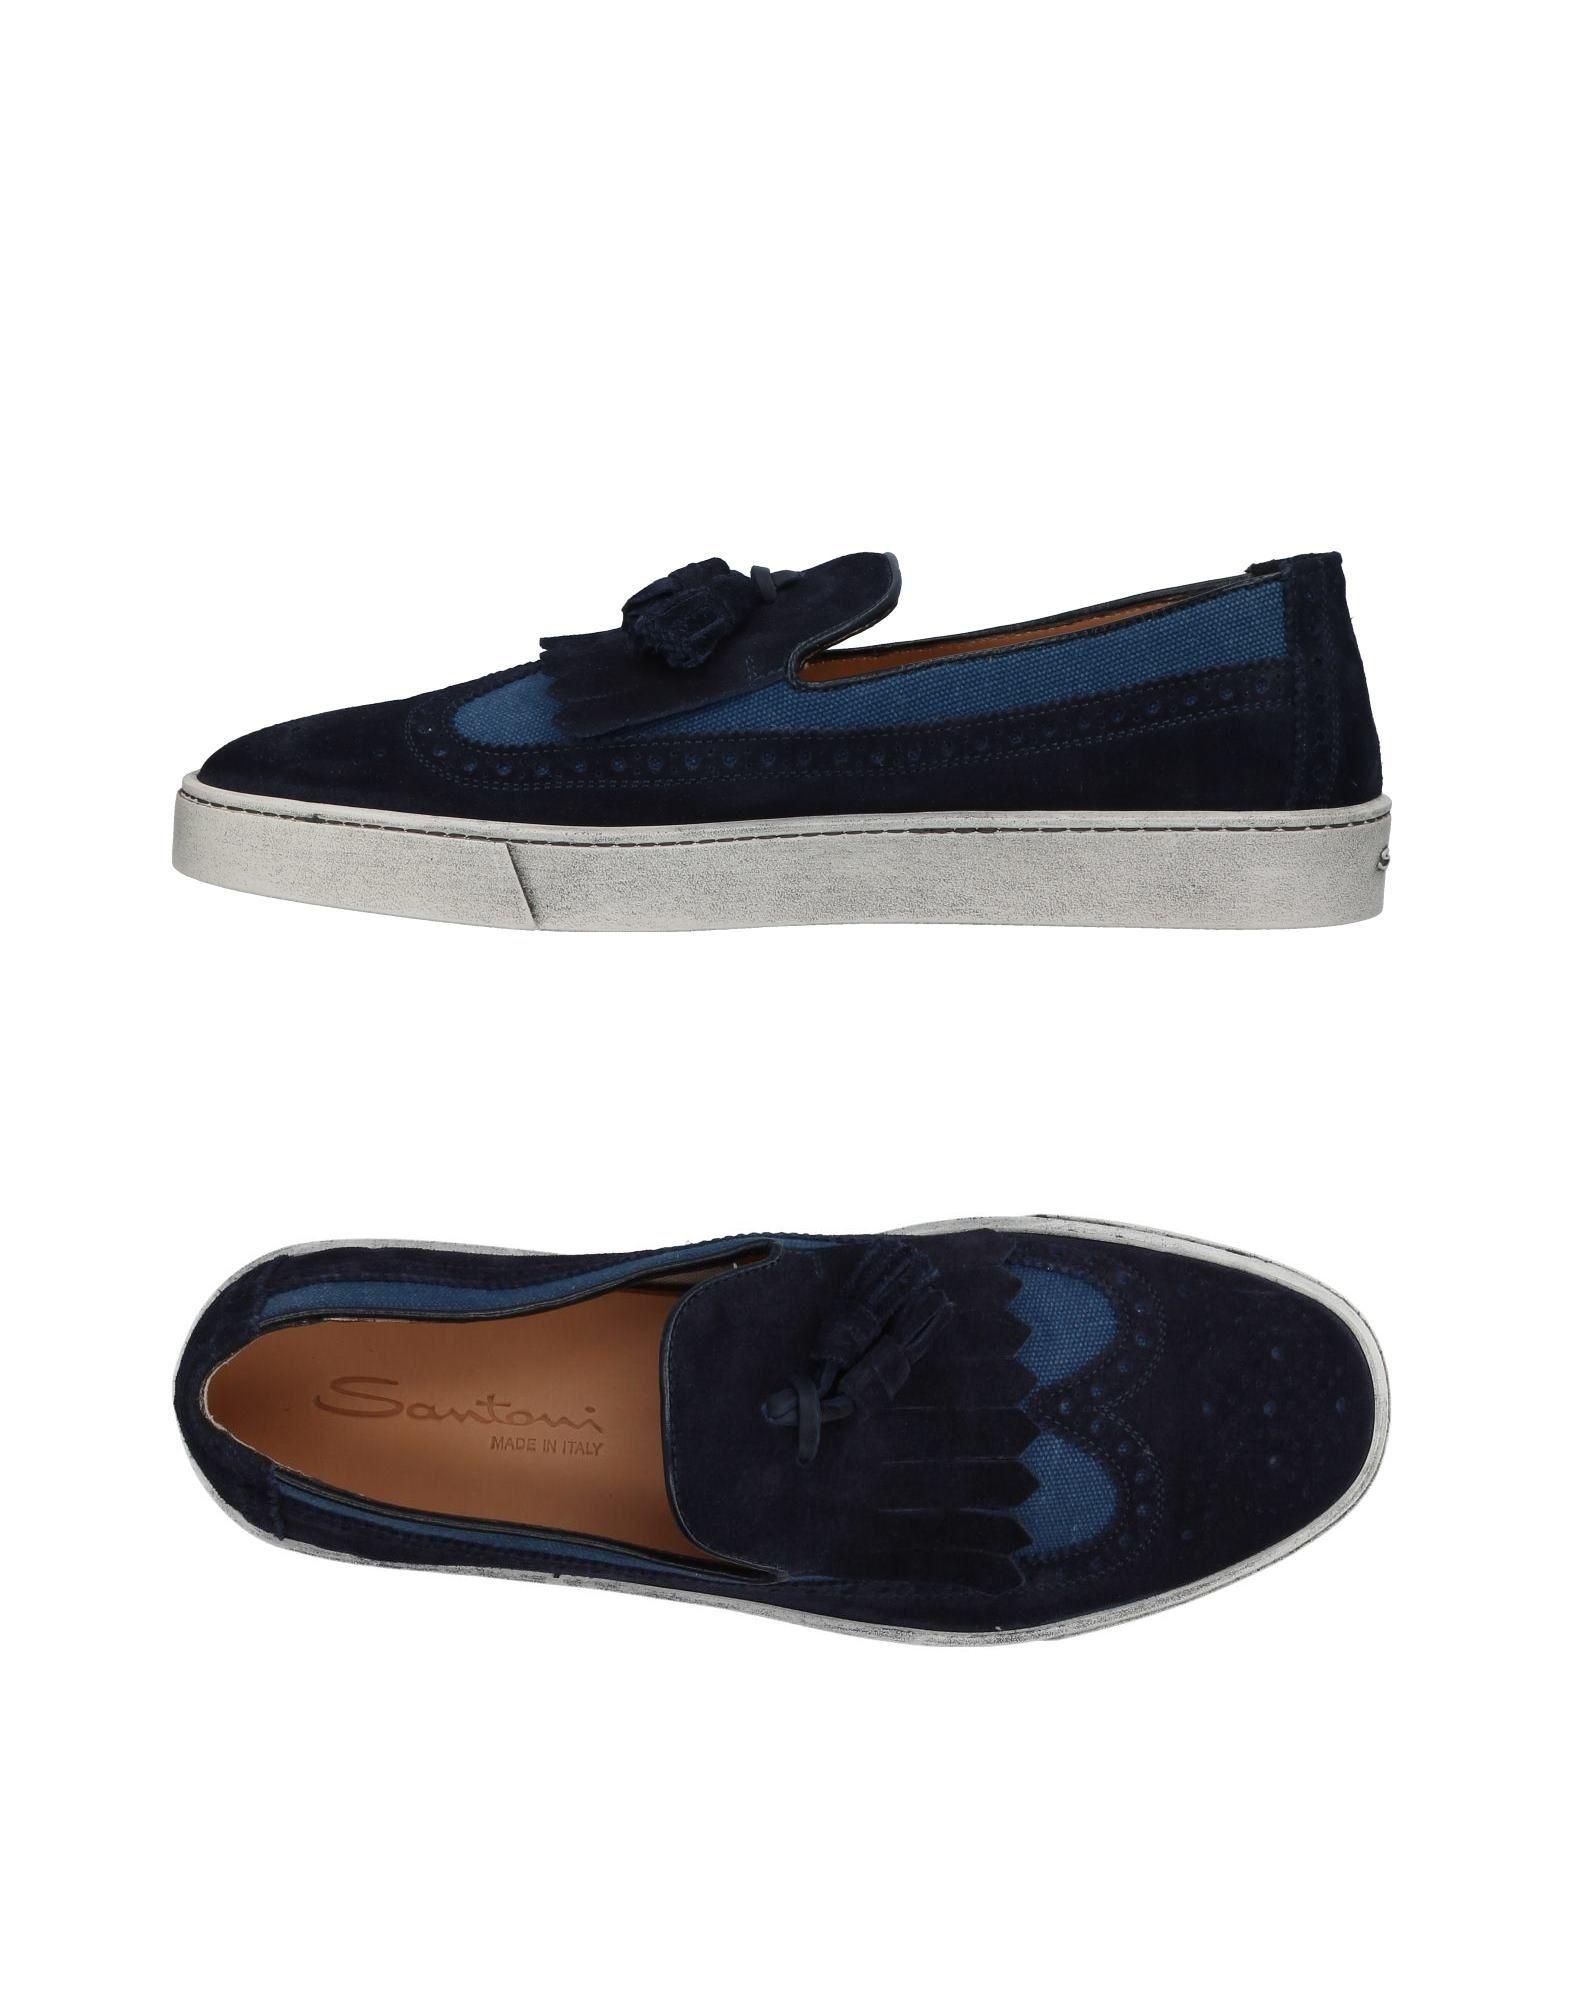 Santoni Mokassins Herren  11409874LW Gute Qualität beliebte Schuhe